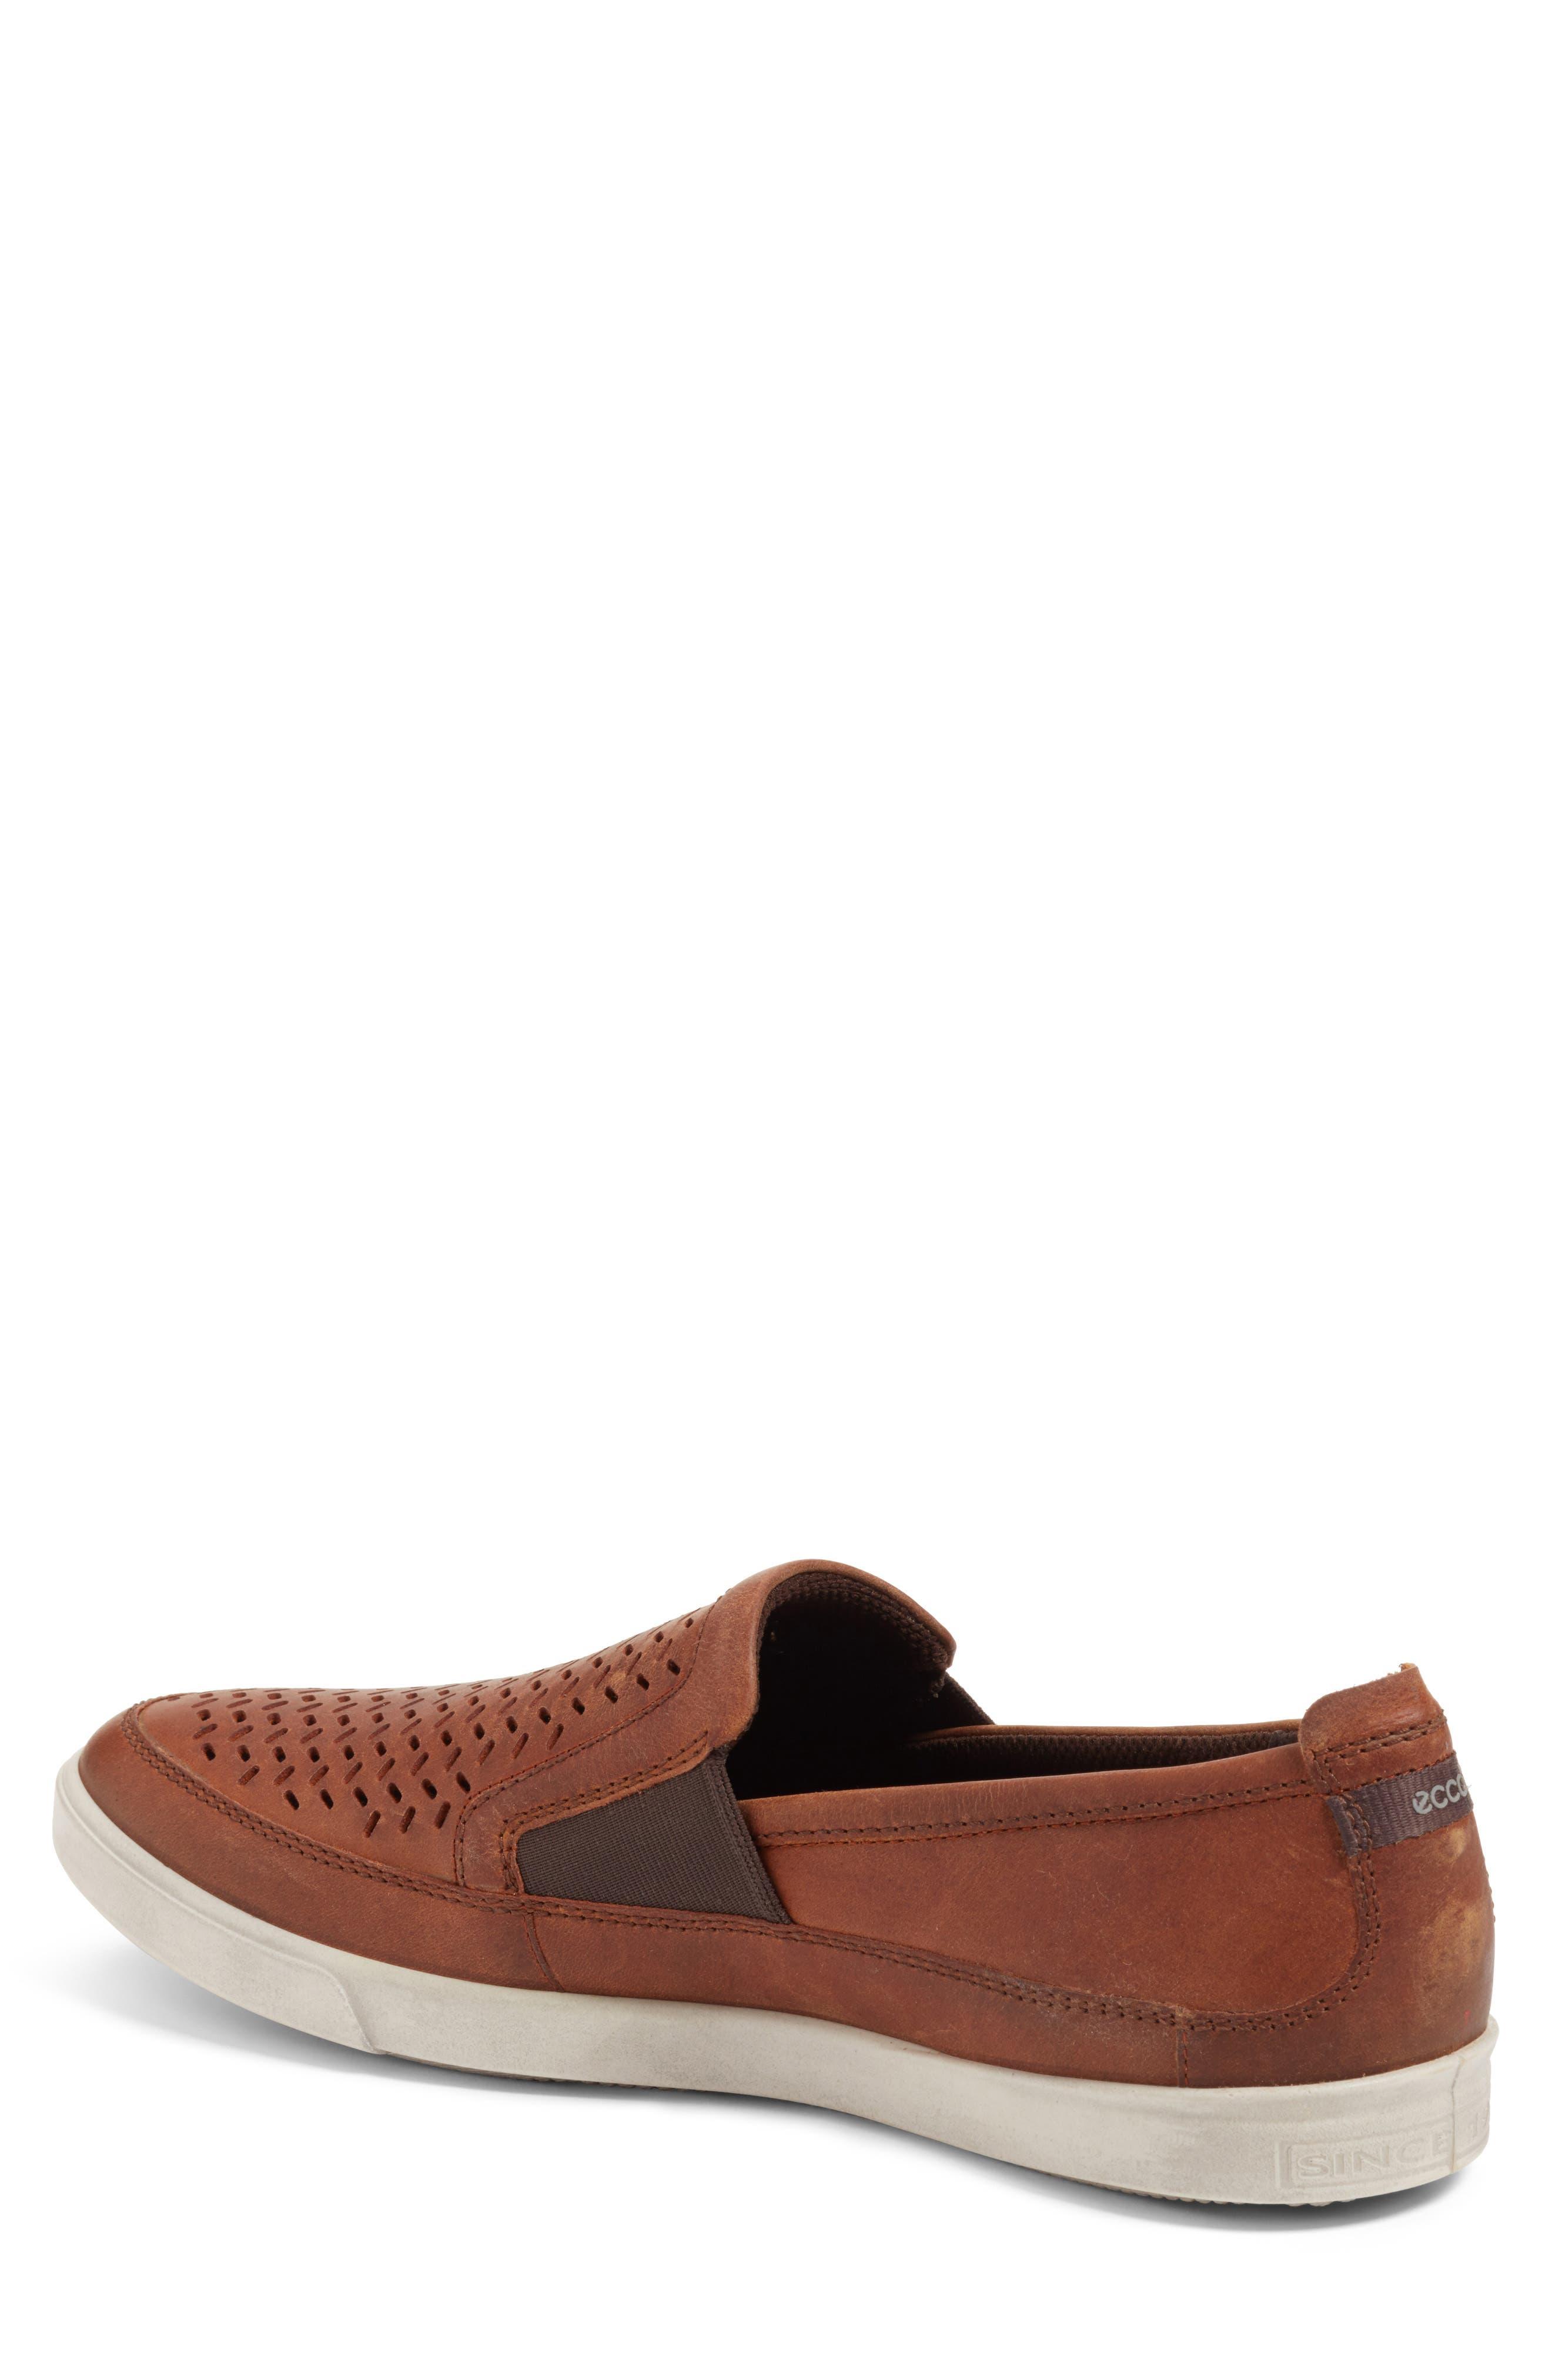 Alternate Image 2  - ECCO 'Collin' Perforated Slip On Sneaker (Men)